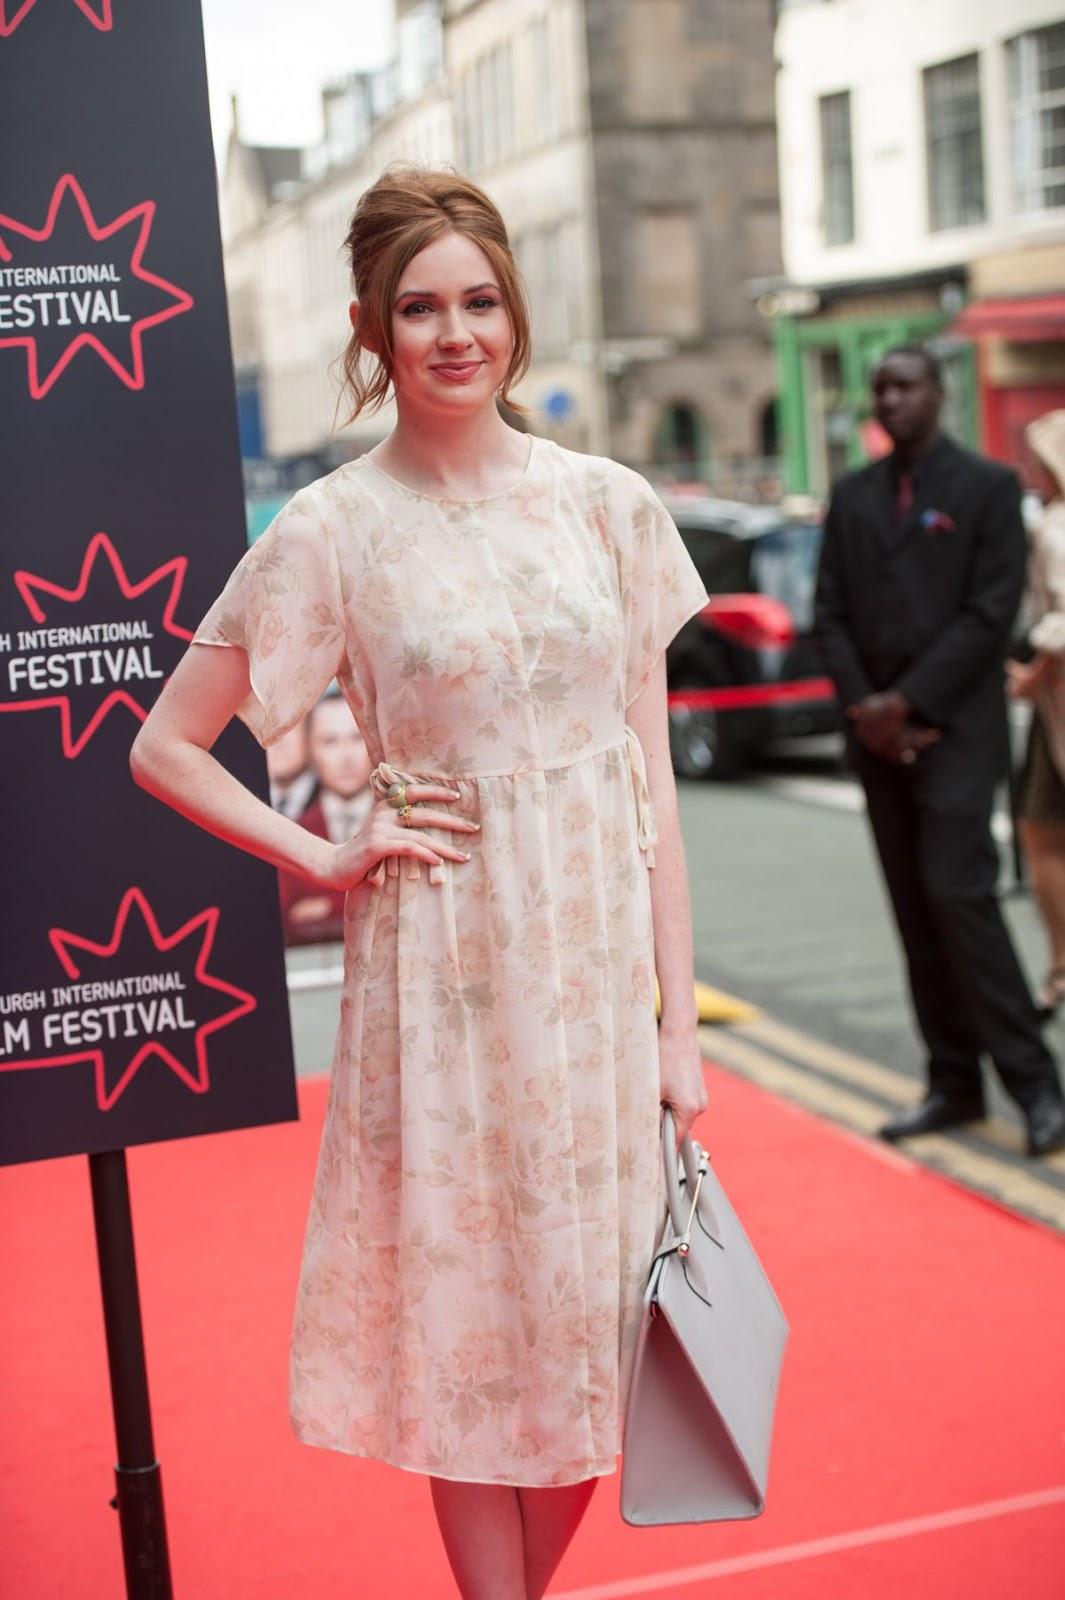 HD Photos of Jumanji actress Karen Gillan Attends Edinburgh Film Festival